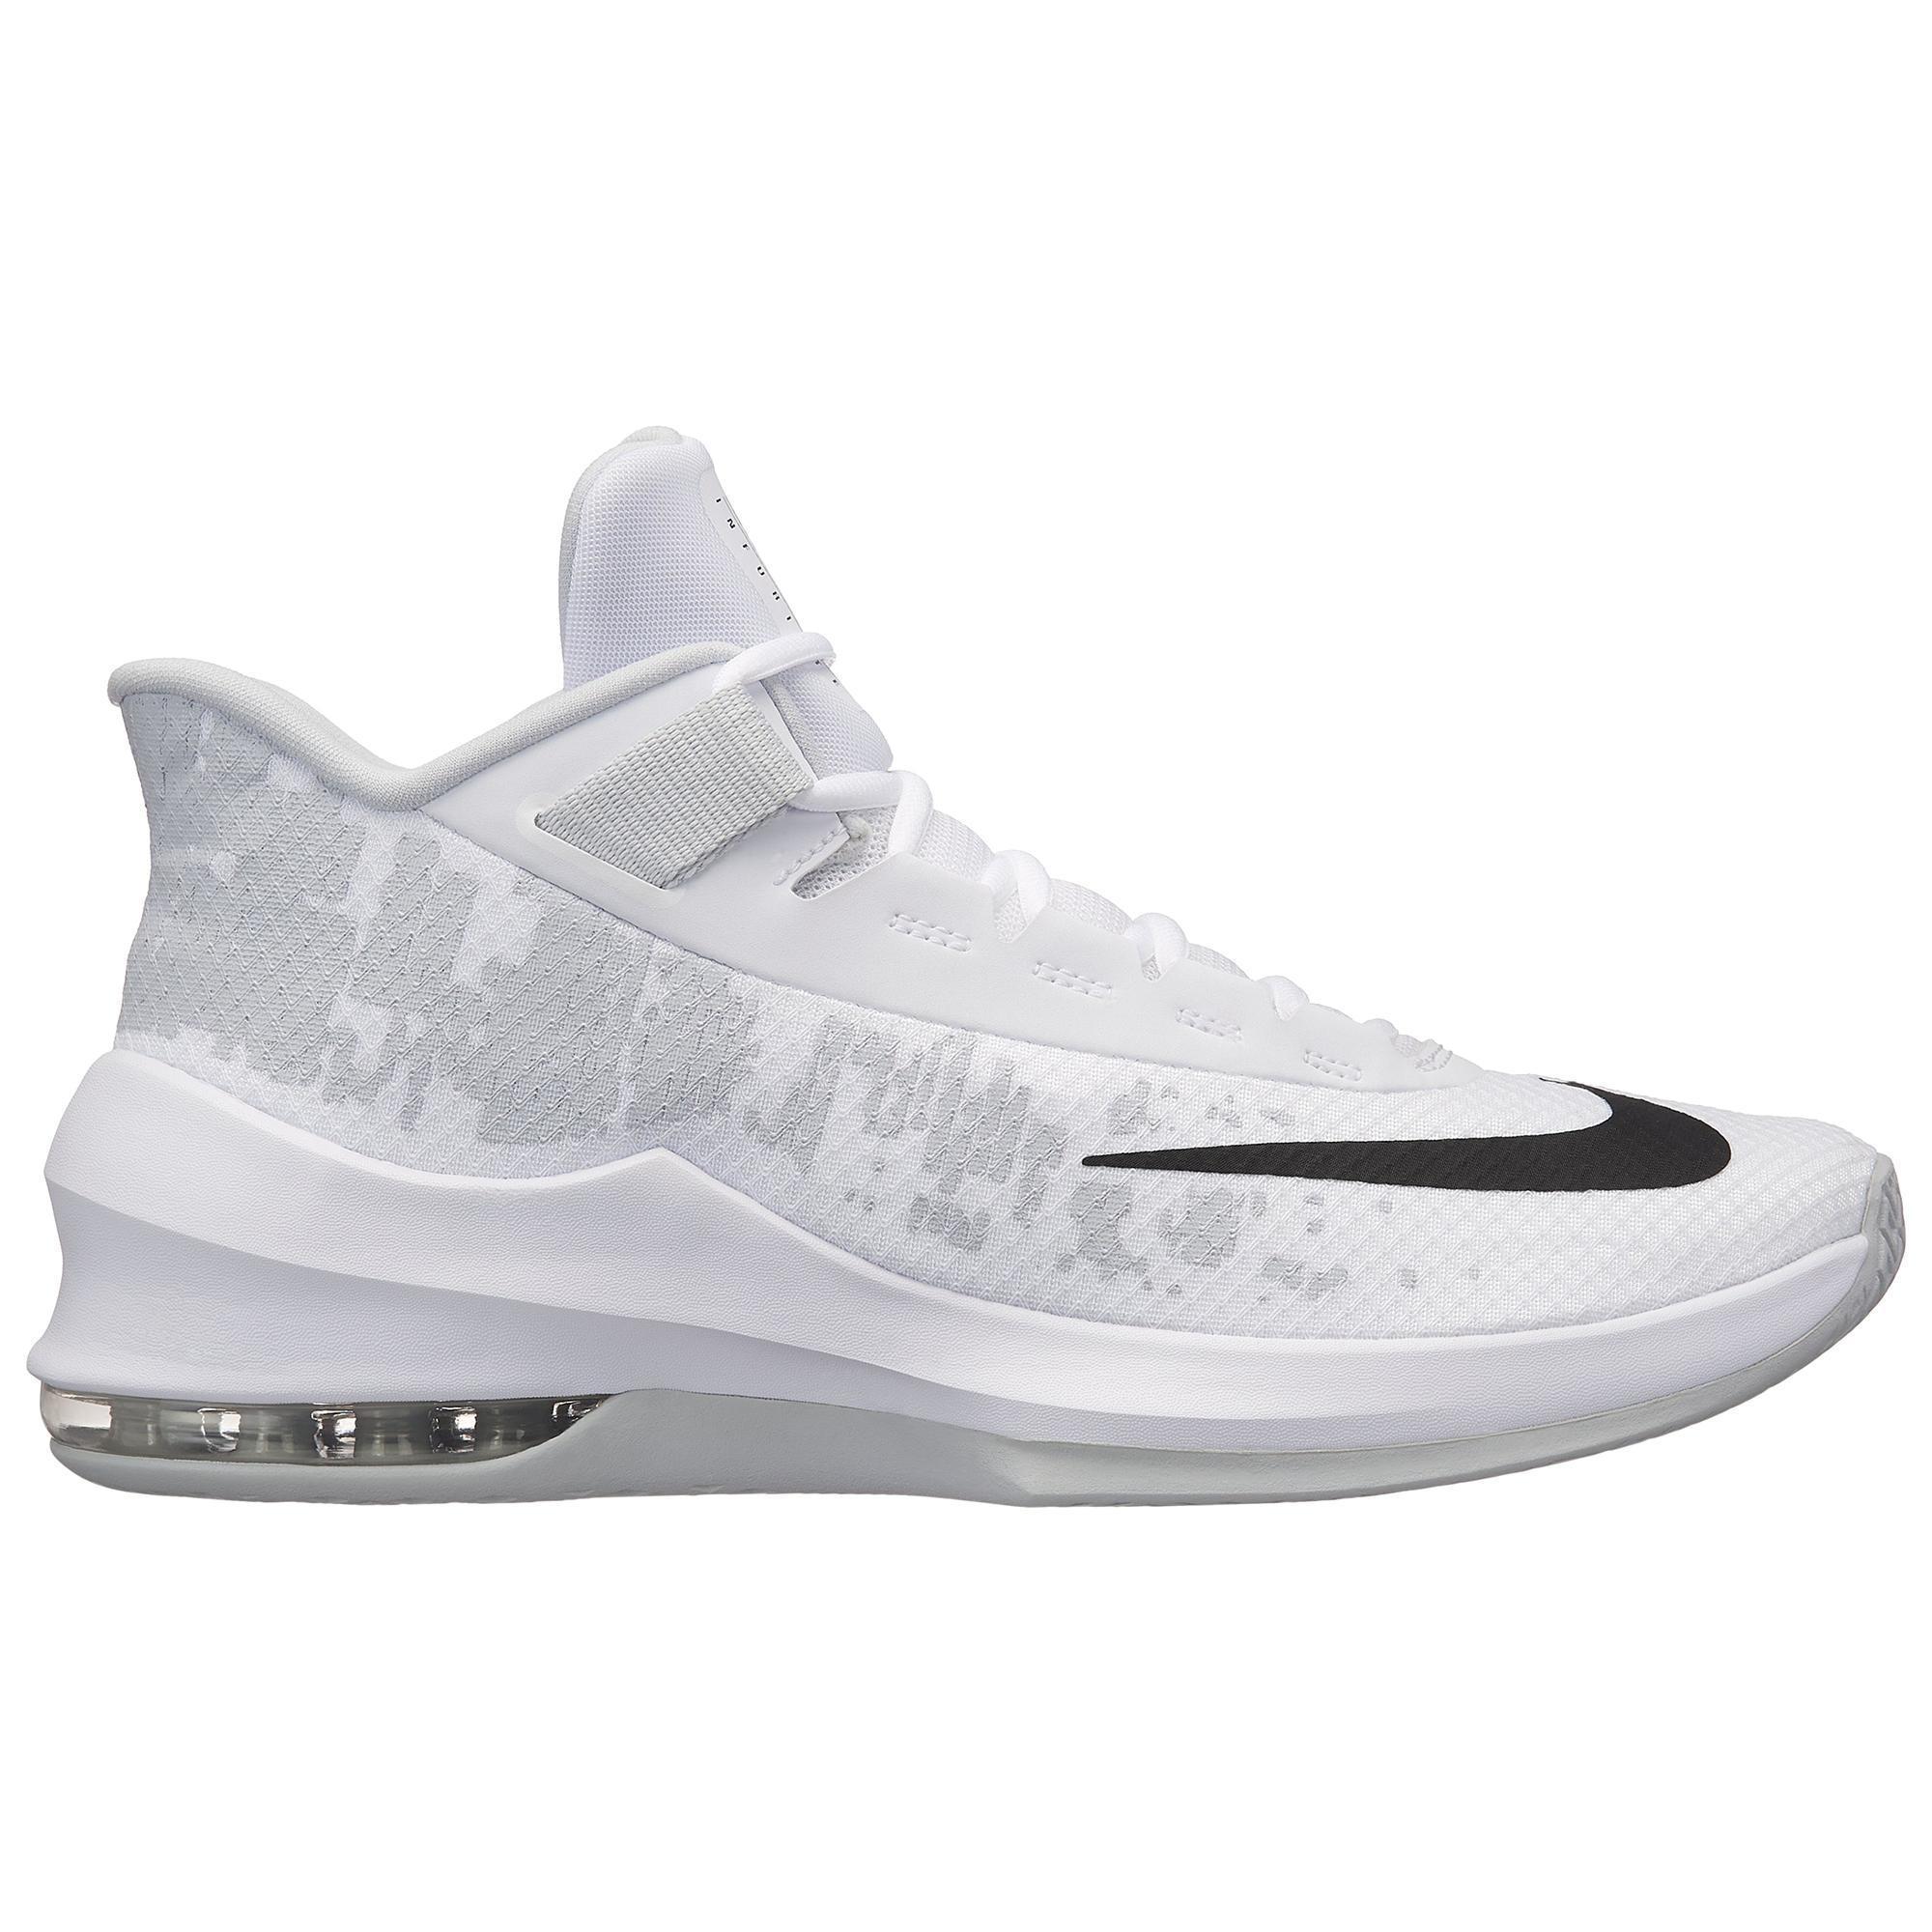 2617778 Nike Basketbalschoenen Air Max Infuriate 2 wit zwart